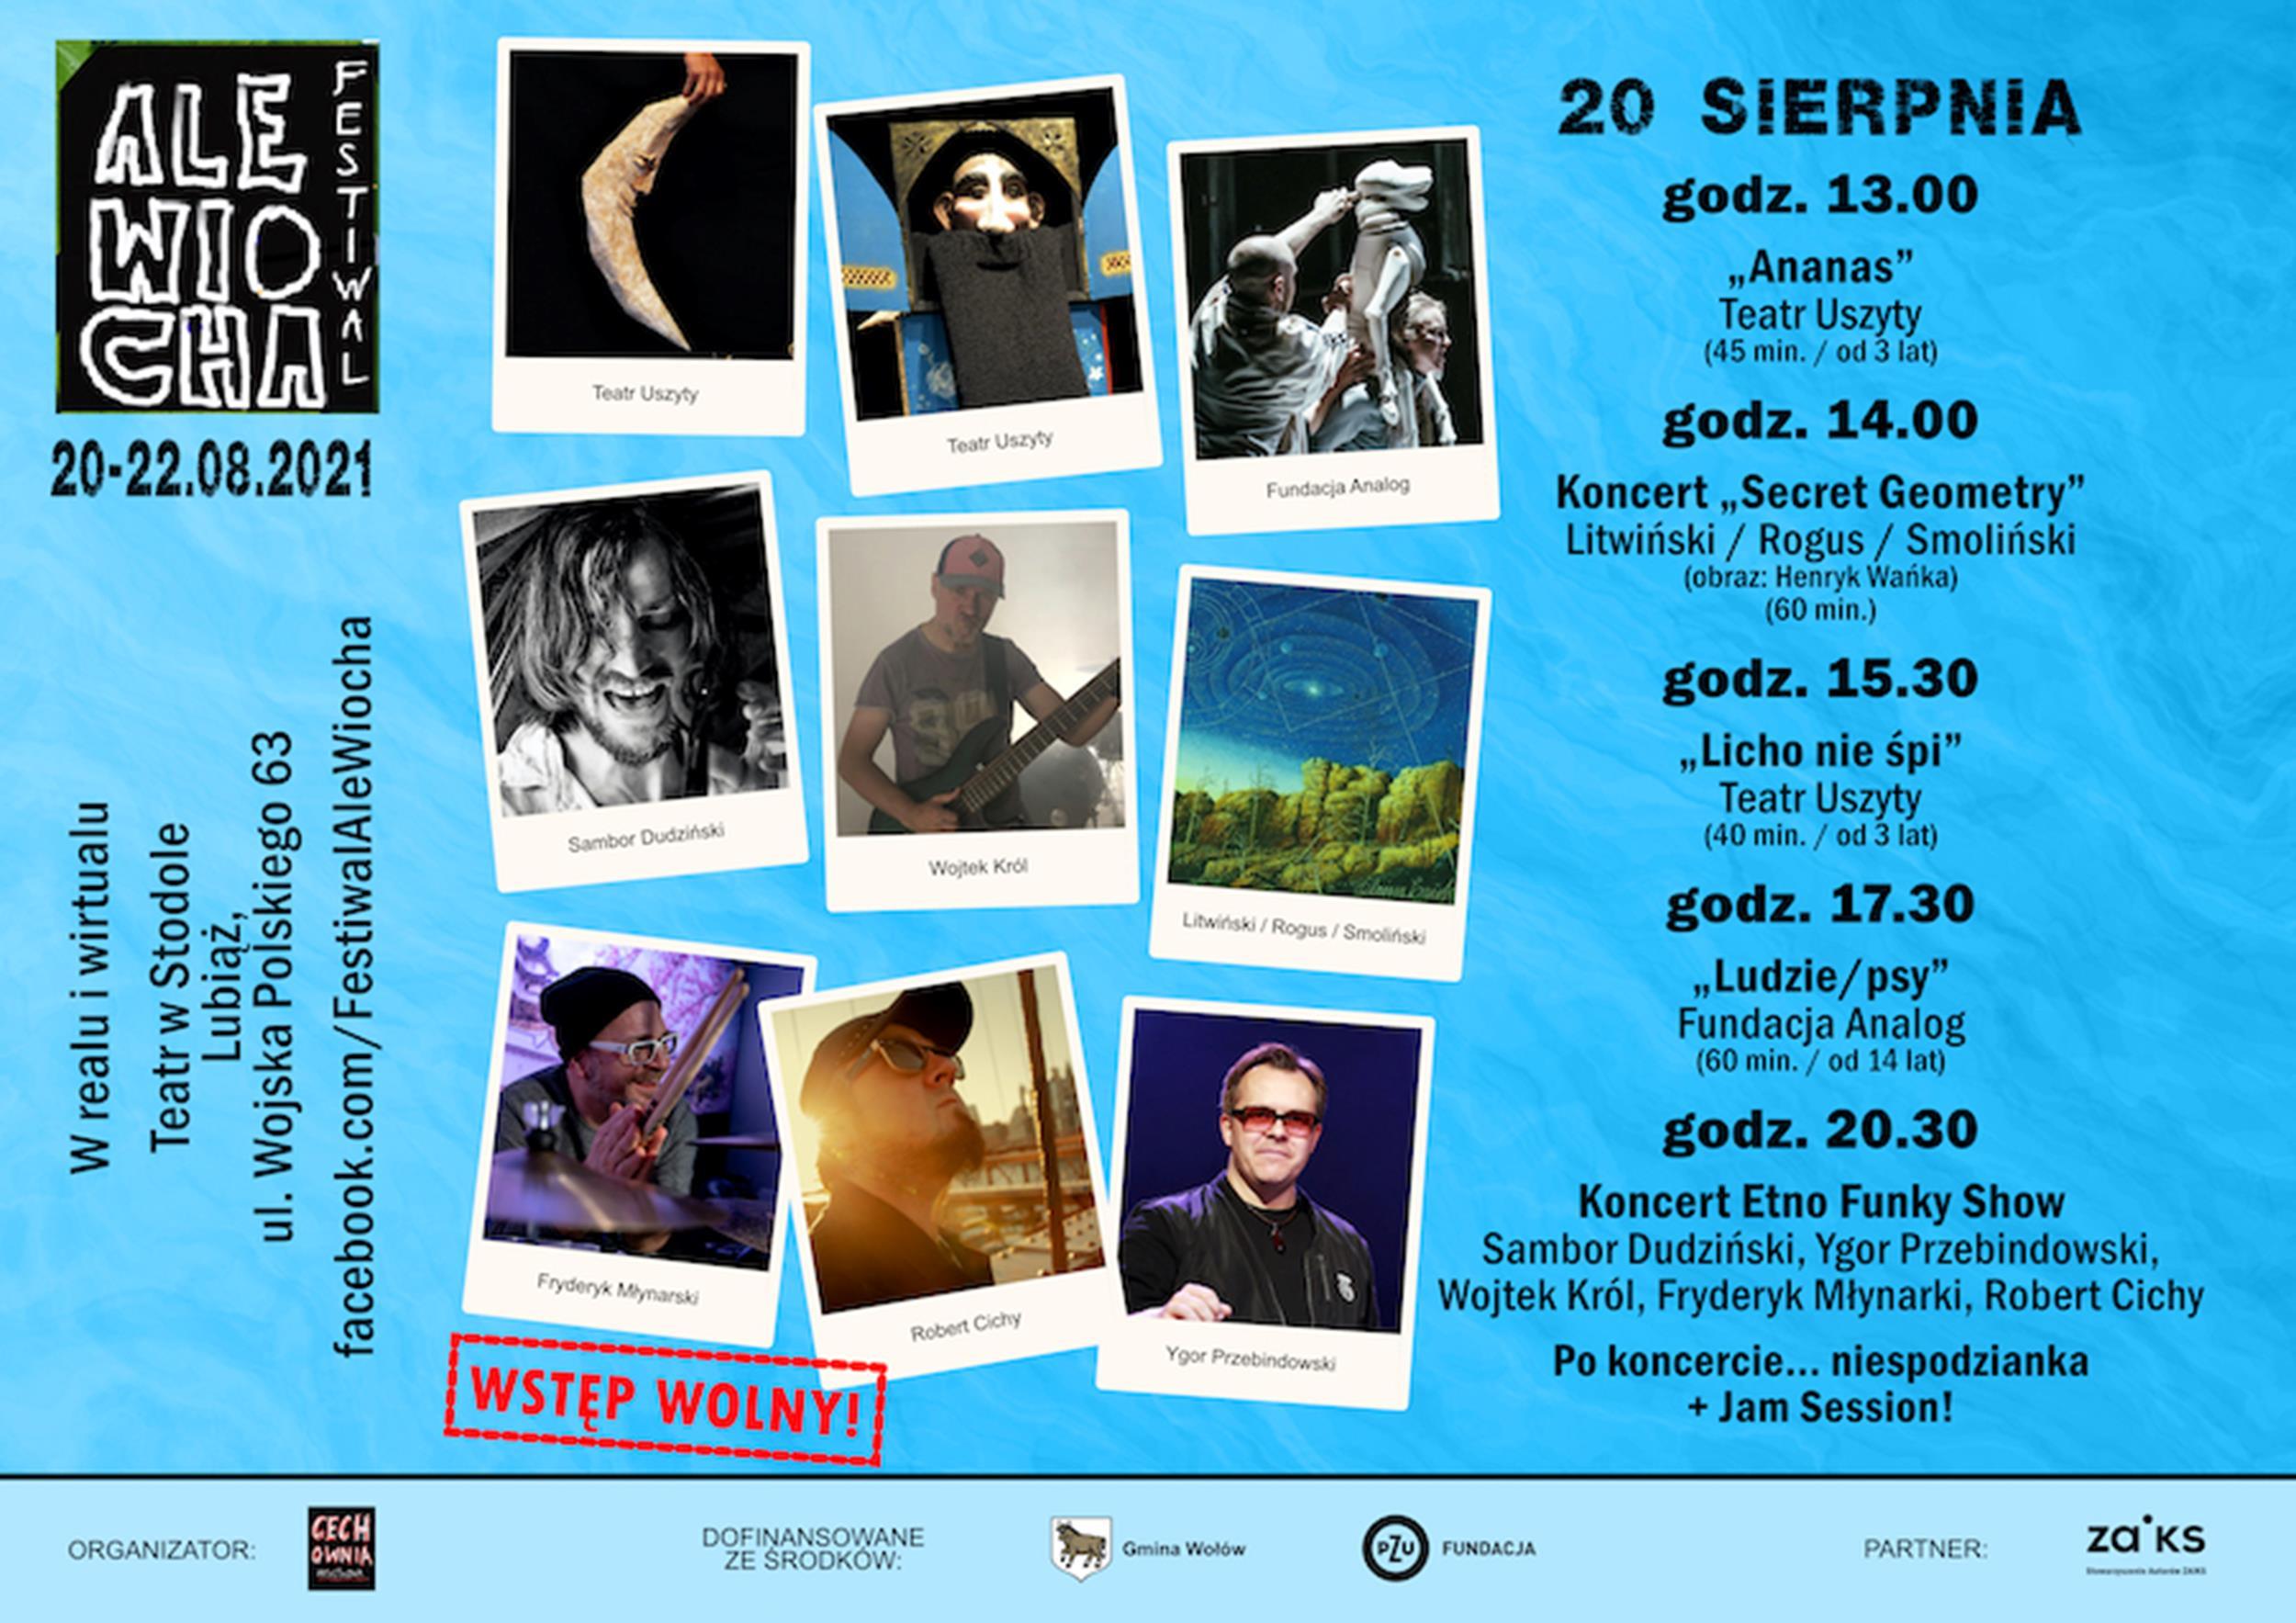 Festiwal Ale Wiocha 2021 Program (Dzień 1)